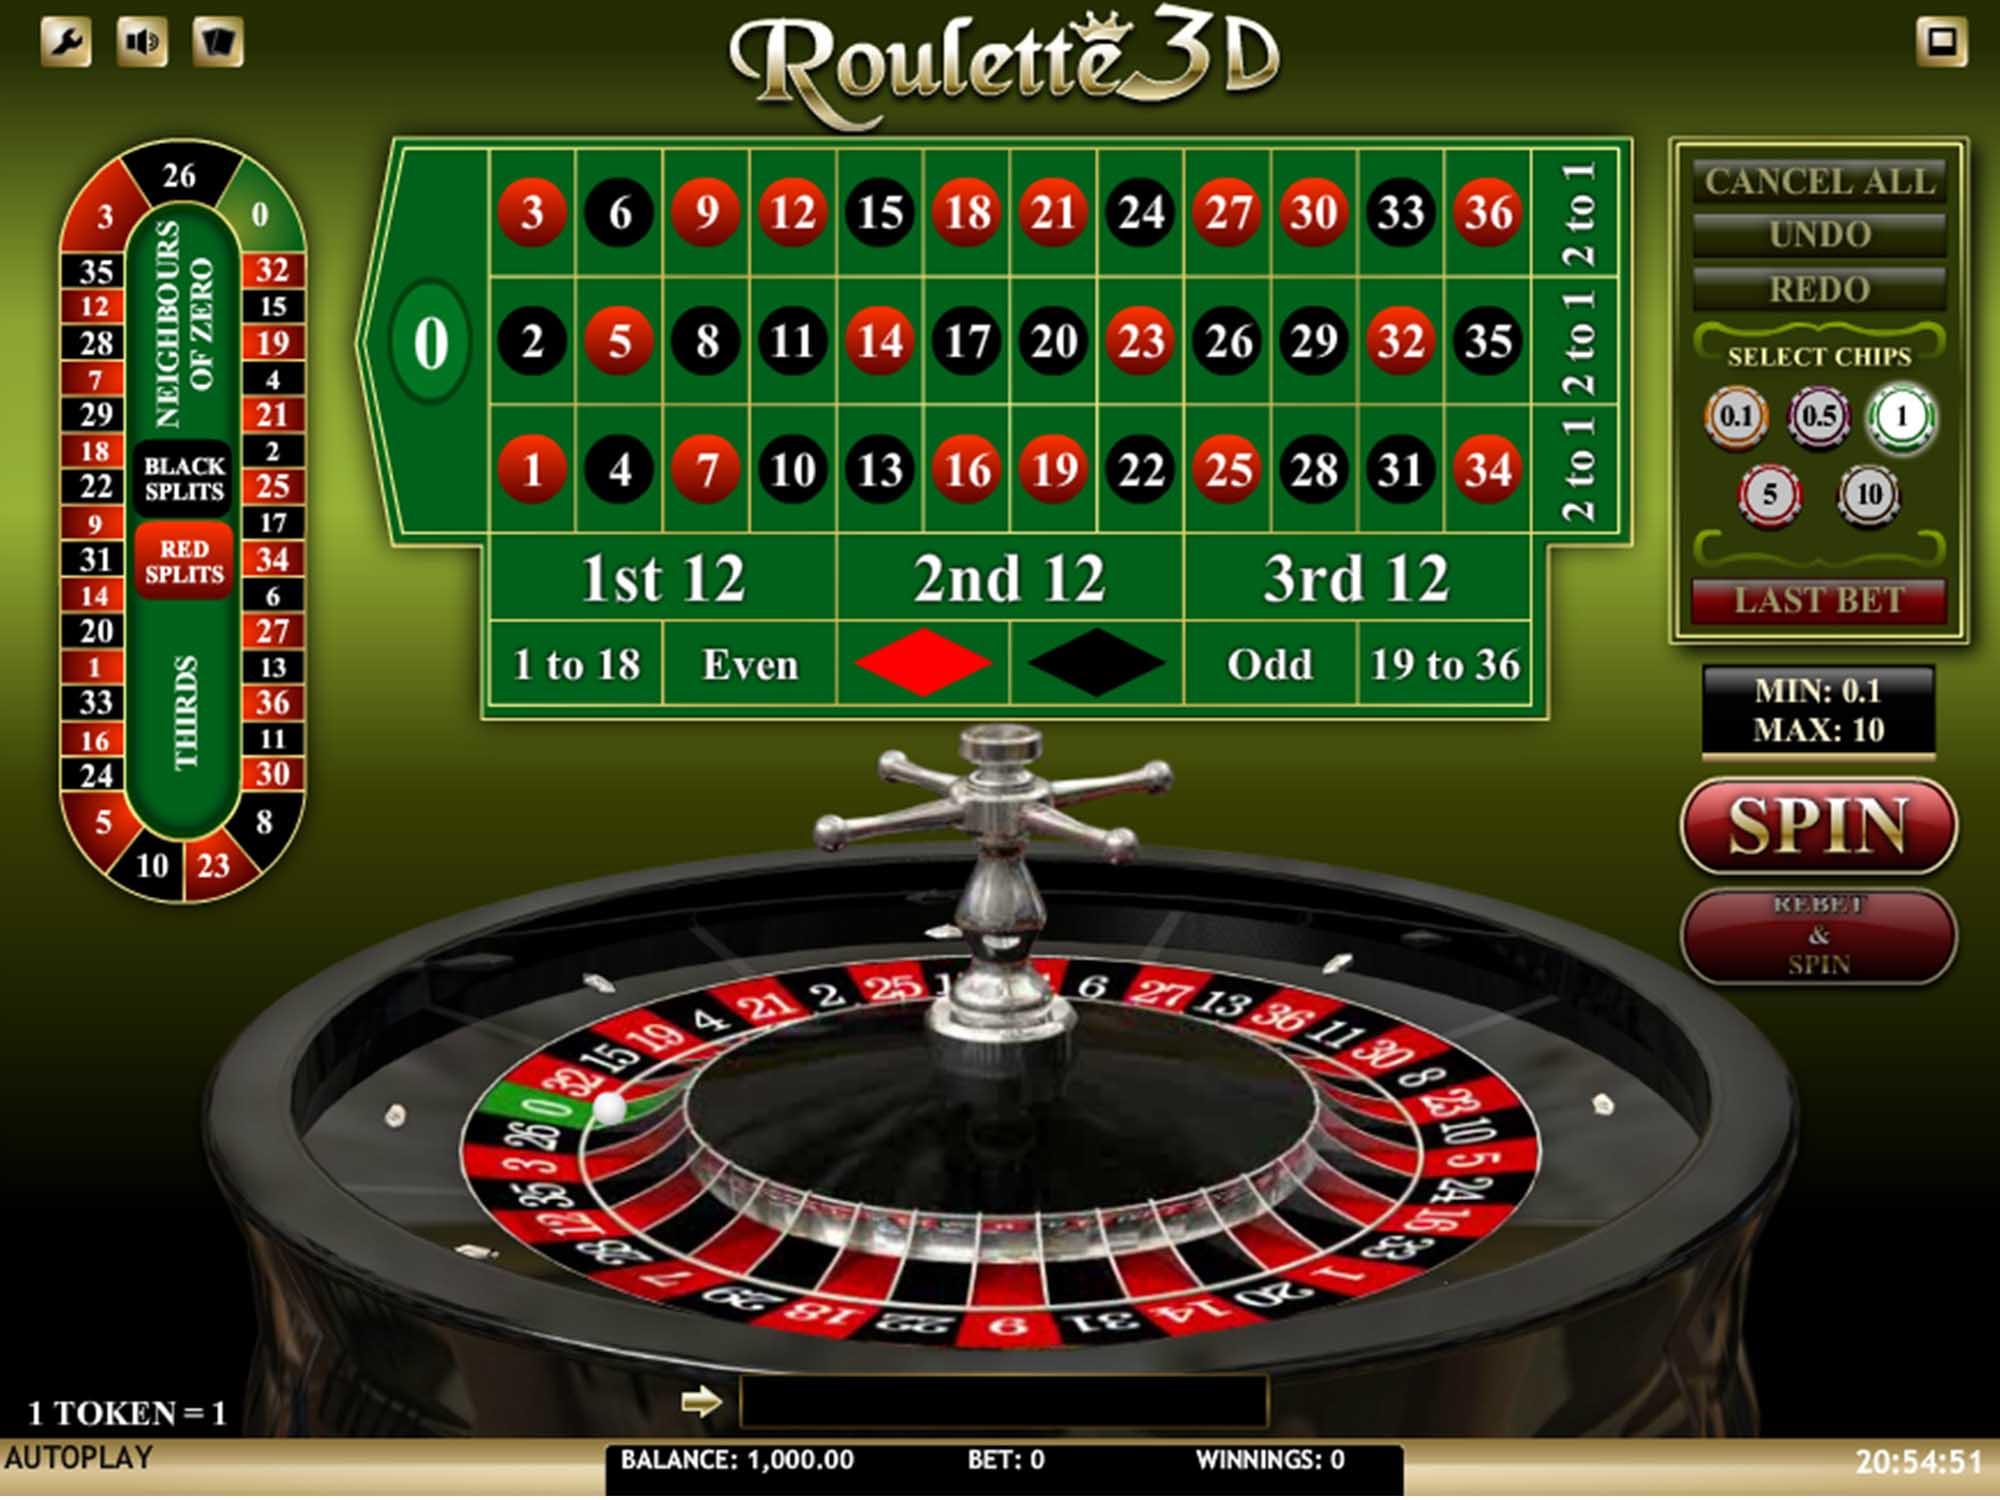 Roulette 3D screenshot